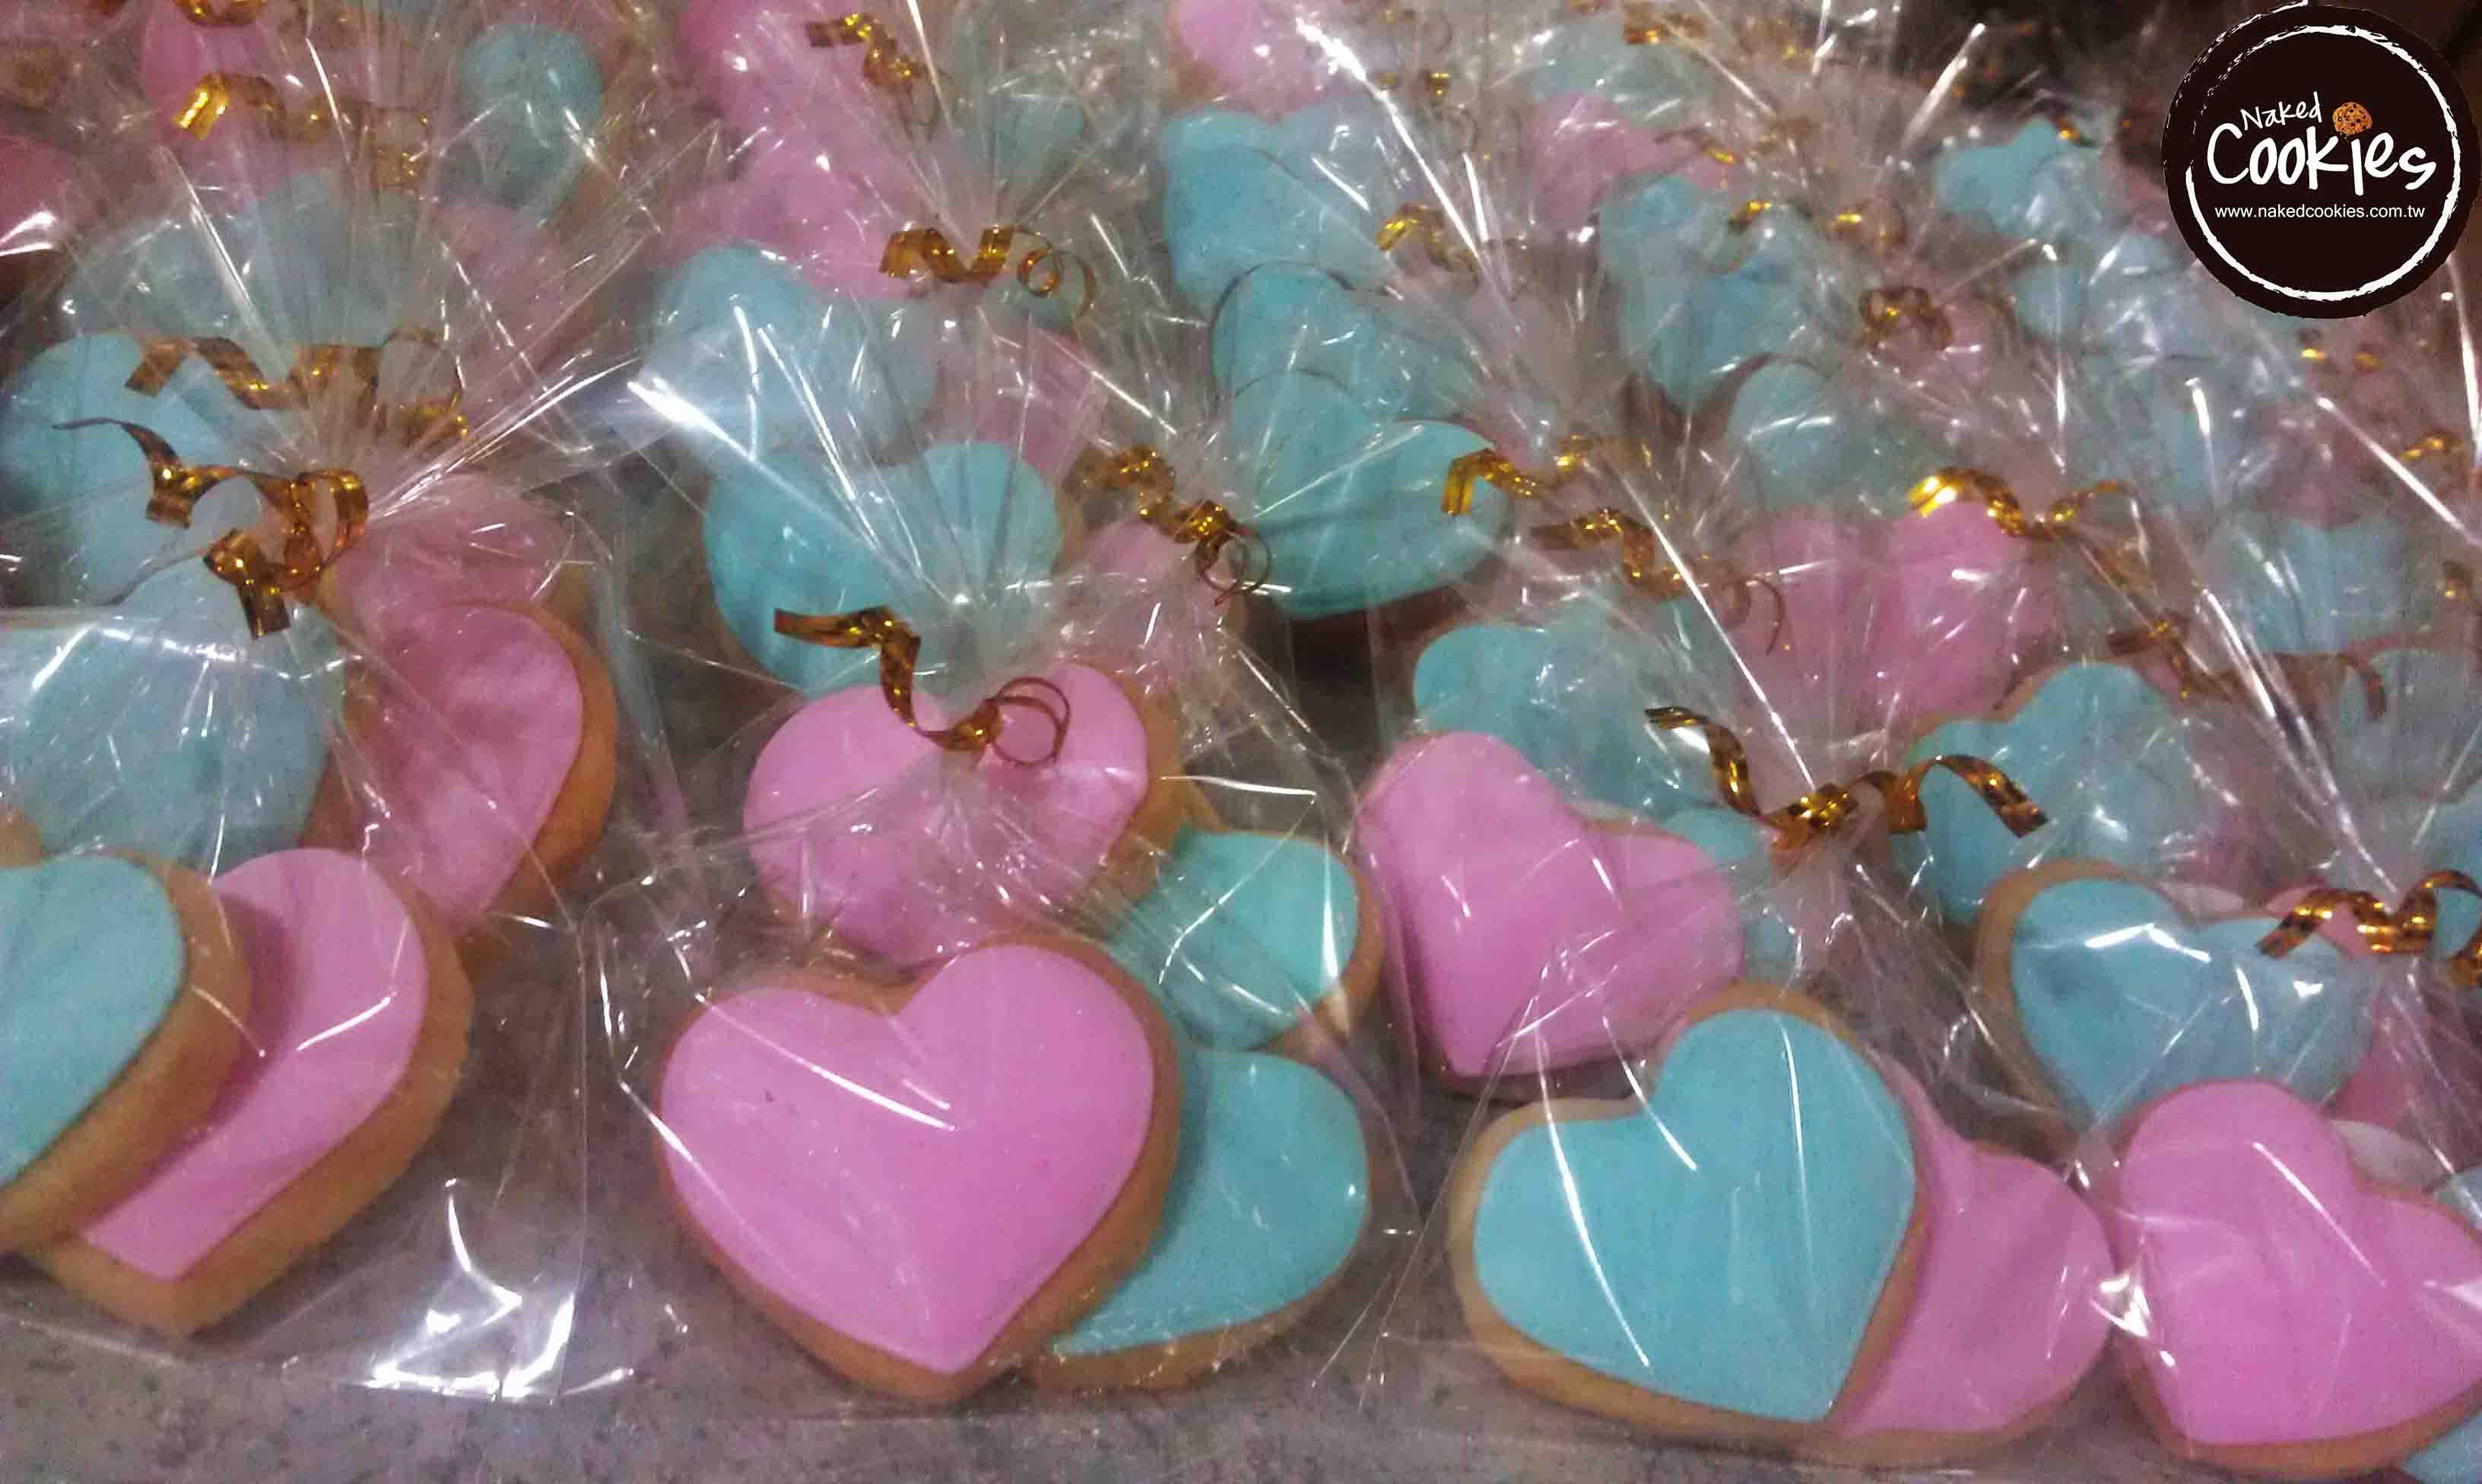 【Naked Cookies】婚禮雙心6組(1組2顆心)-創意手工糖霜餅乾,婚禮小物/生日/活動/收涎/彌月